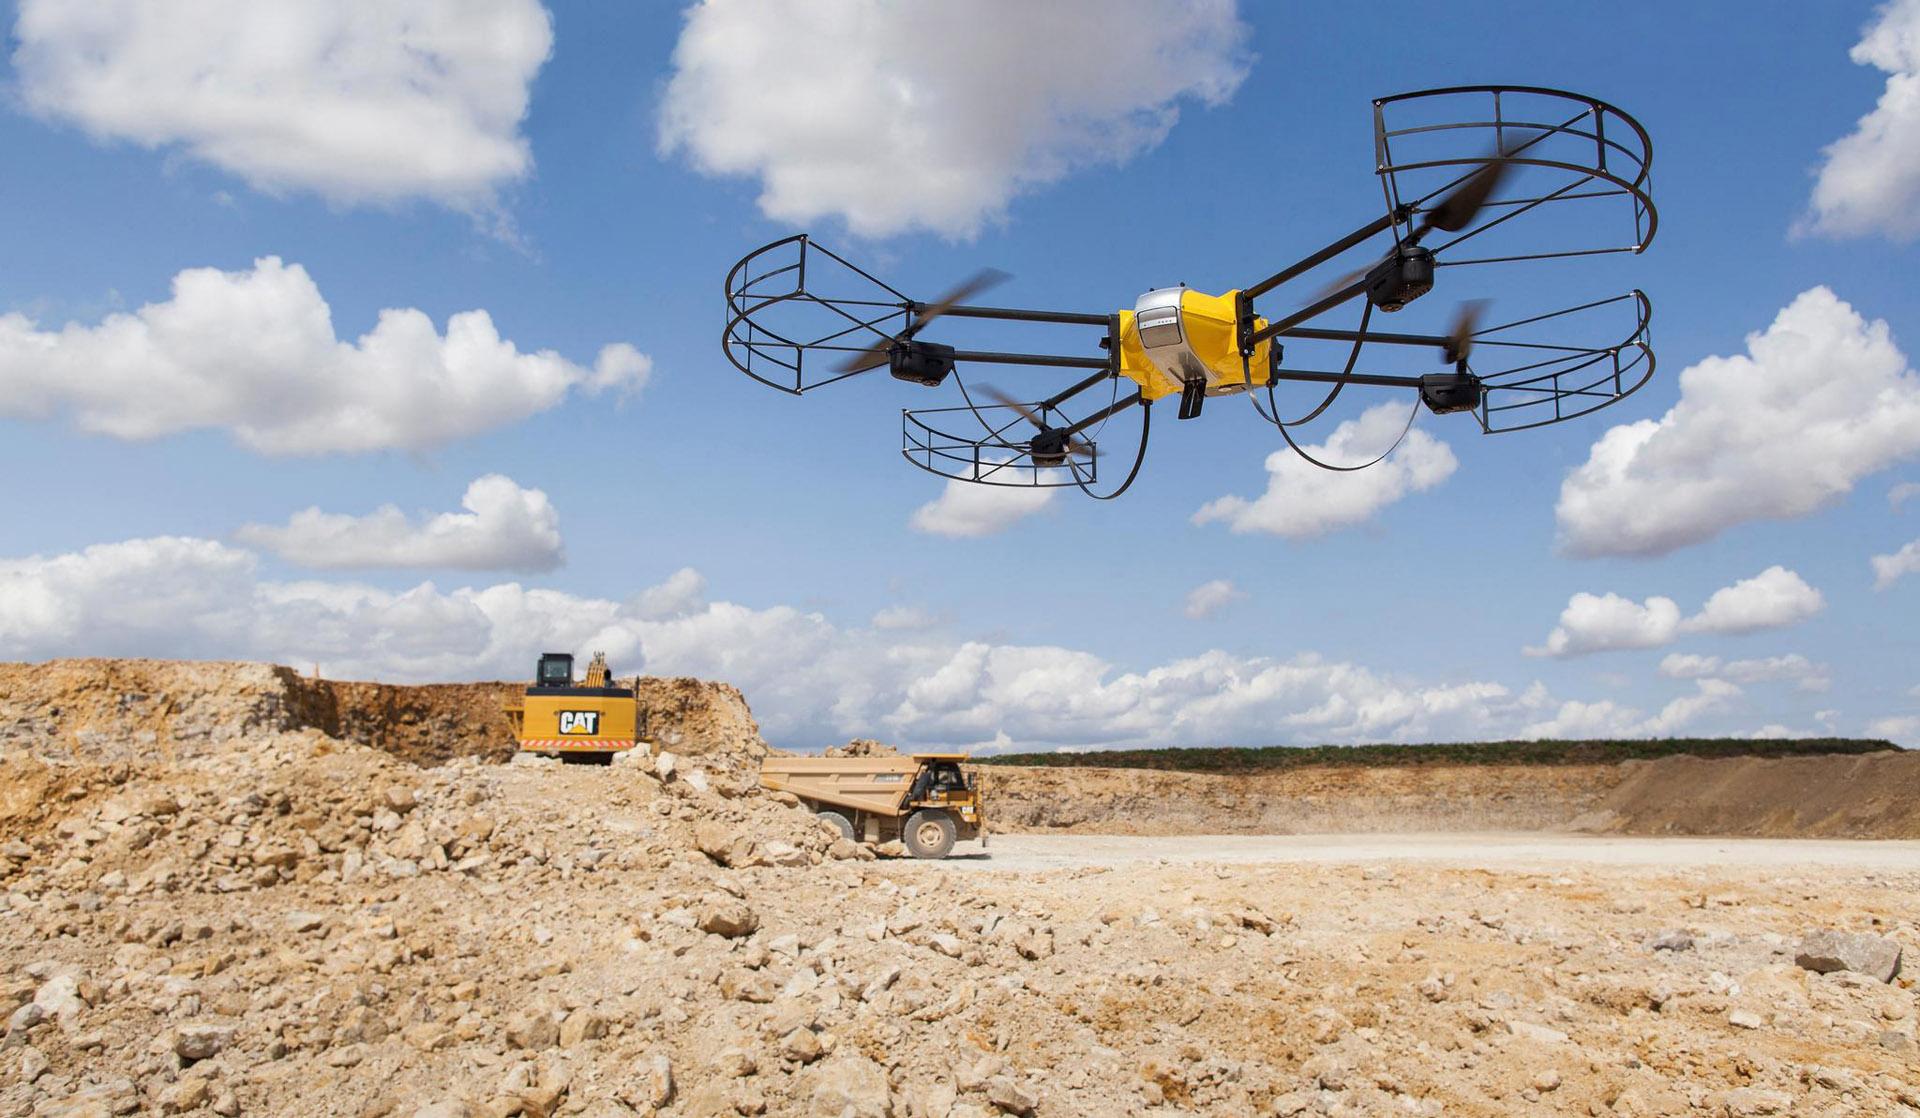 Drone U130 relevé carrière